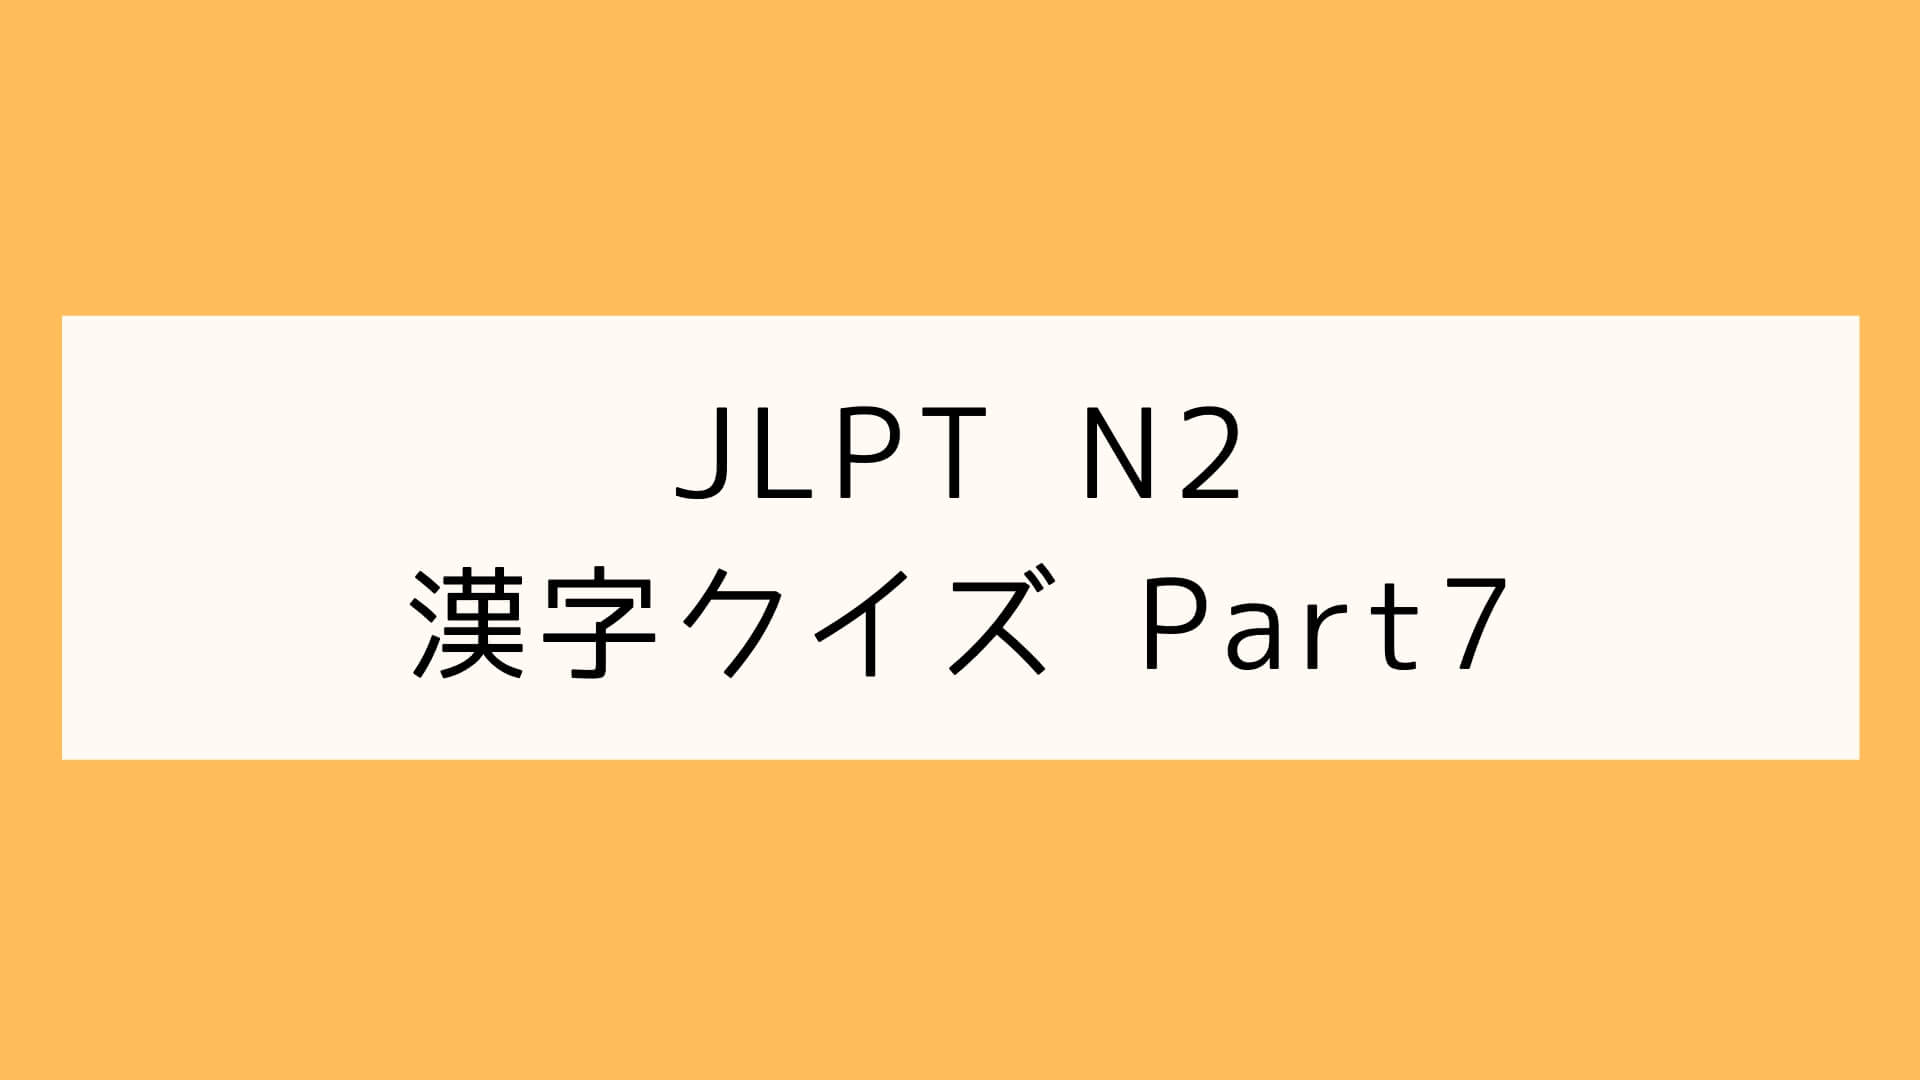 【JLPT N2】漢字クイズ Part7